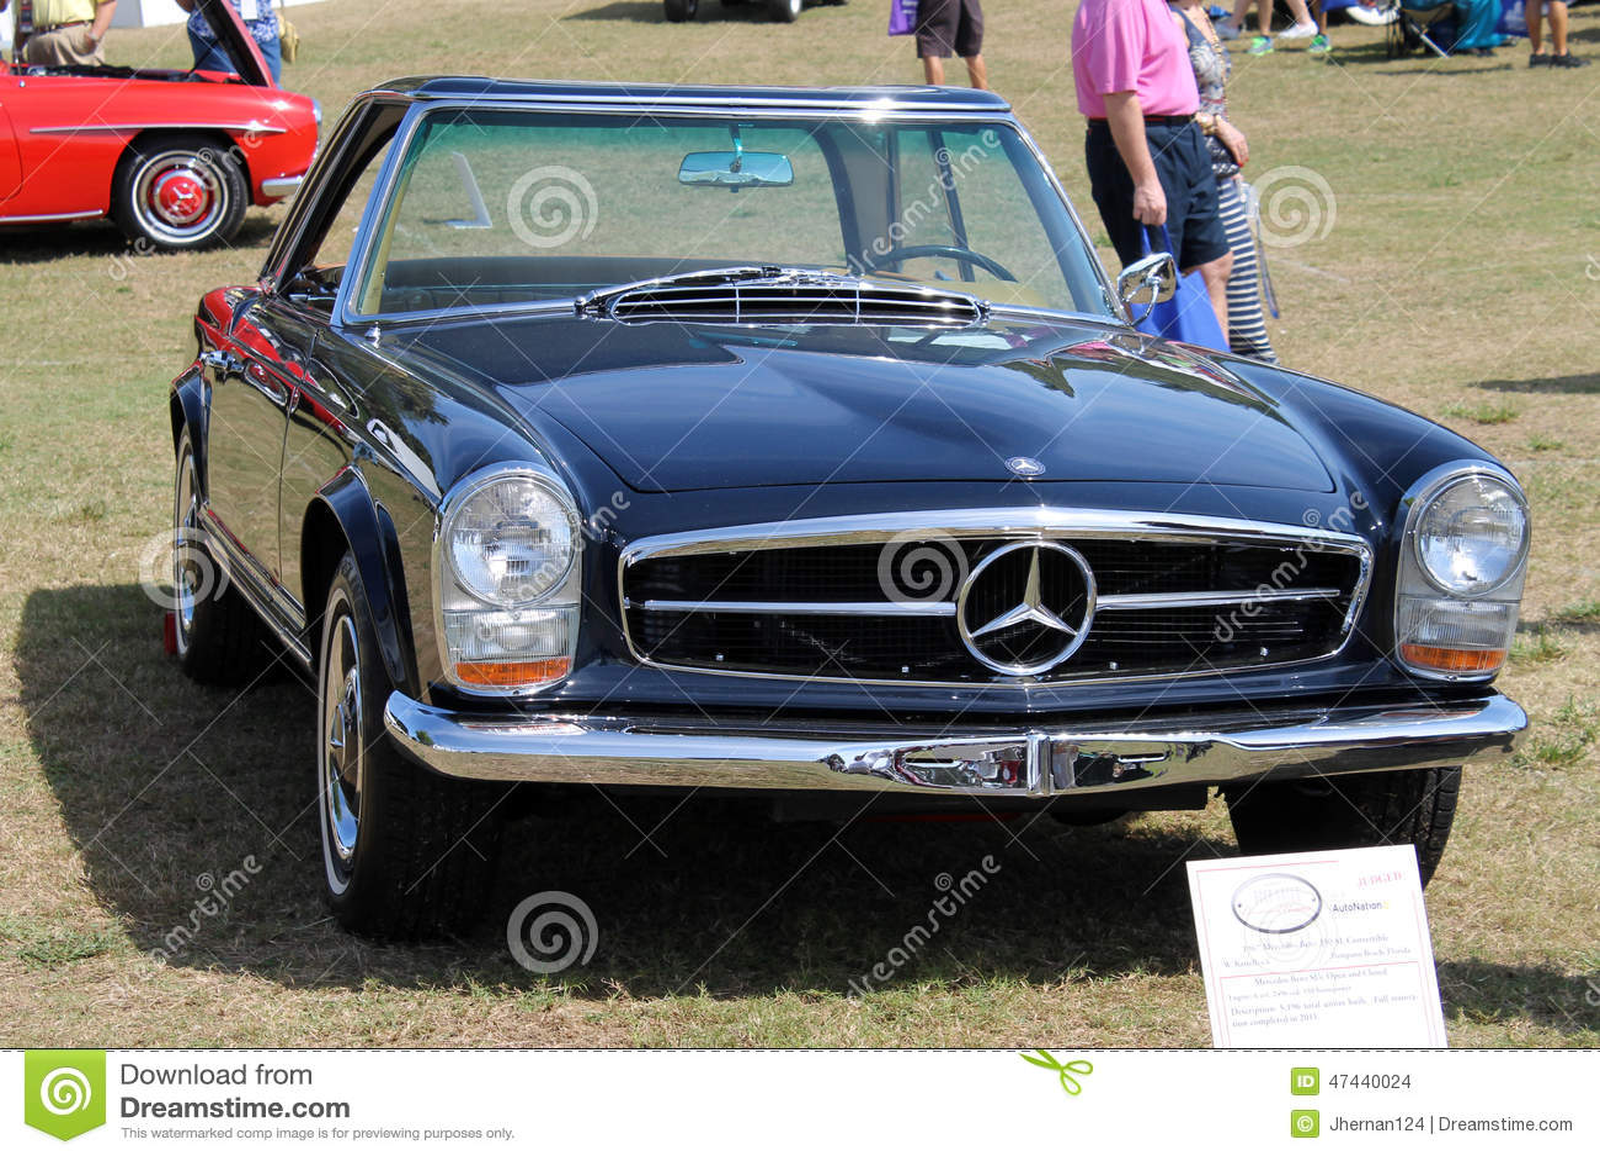 old german sports car front editorial stock image image 47440024. Black Bedroom Furniture Sets. Home Design Ideas